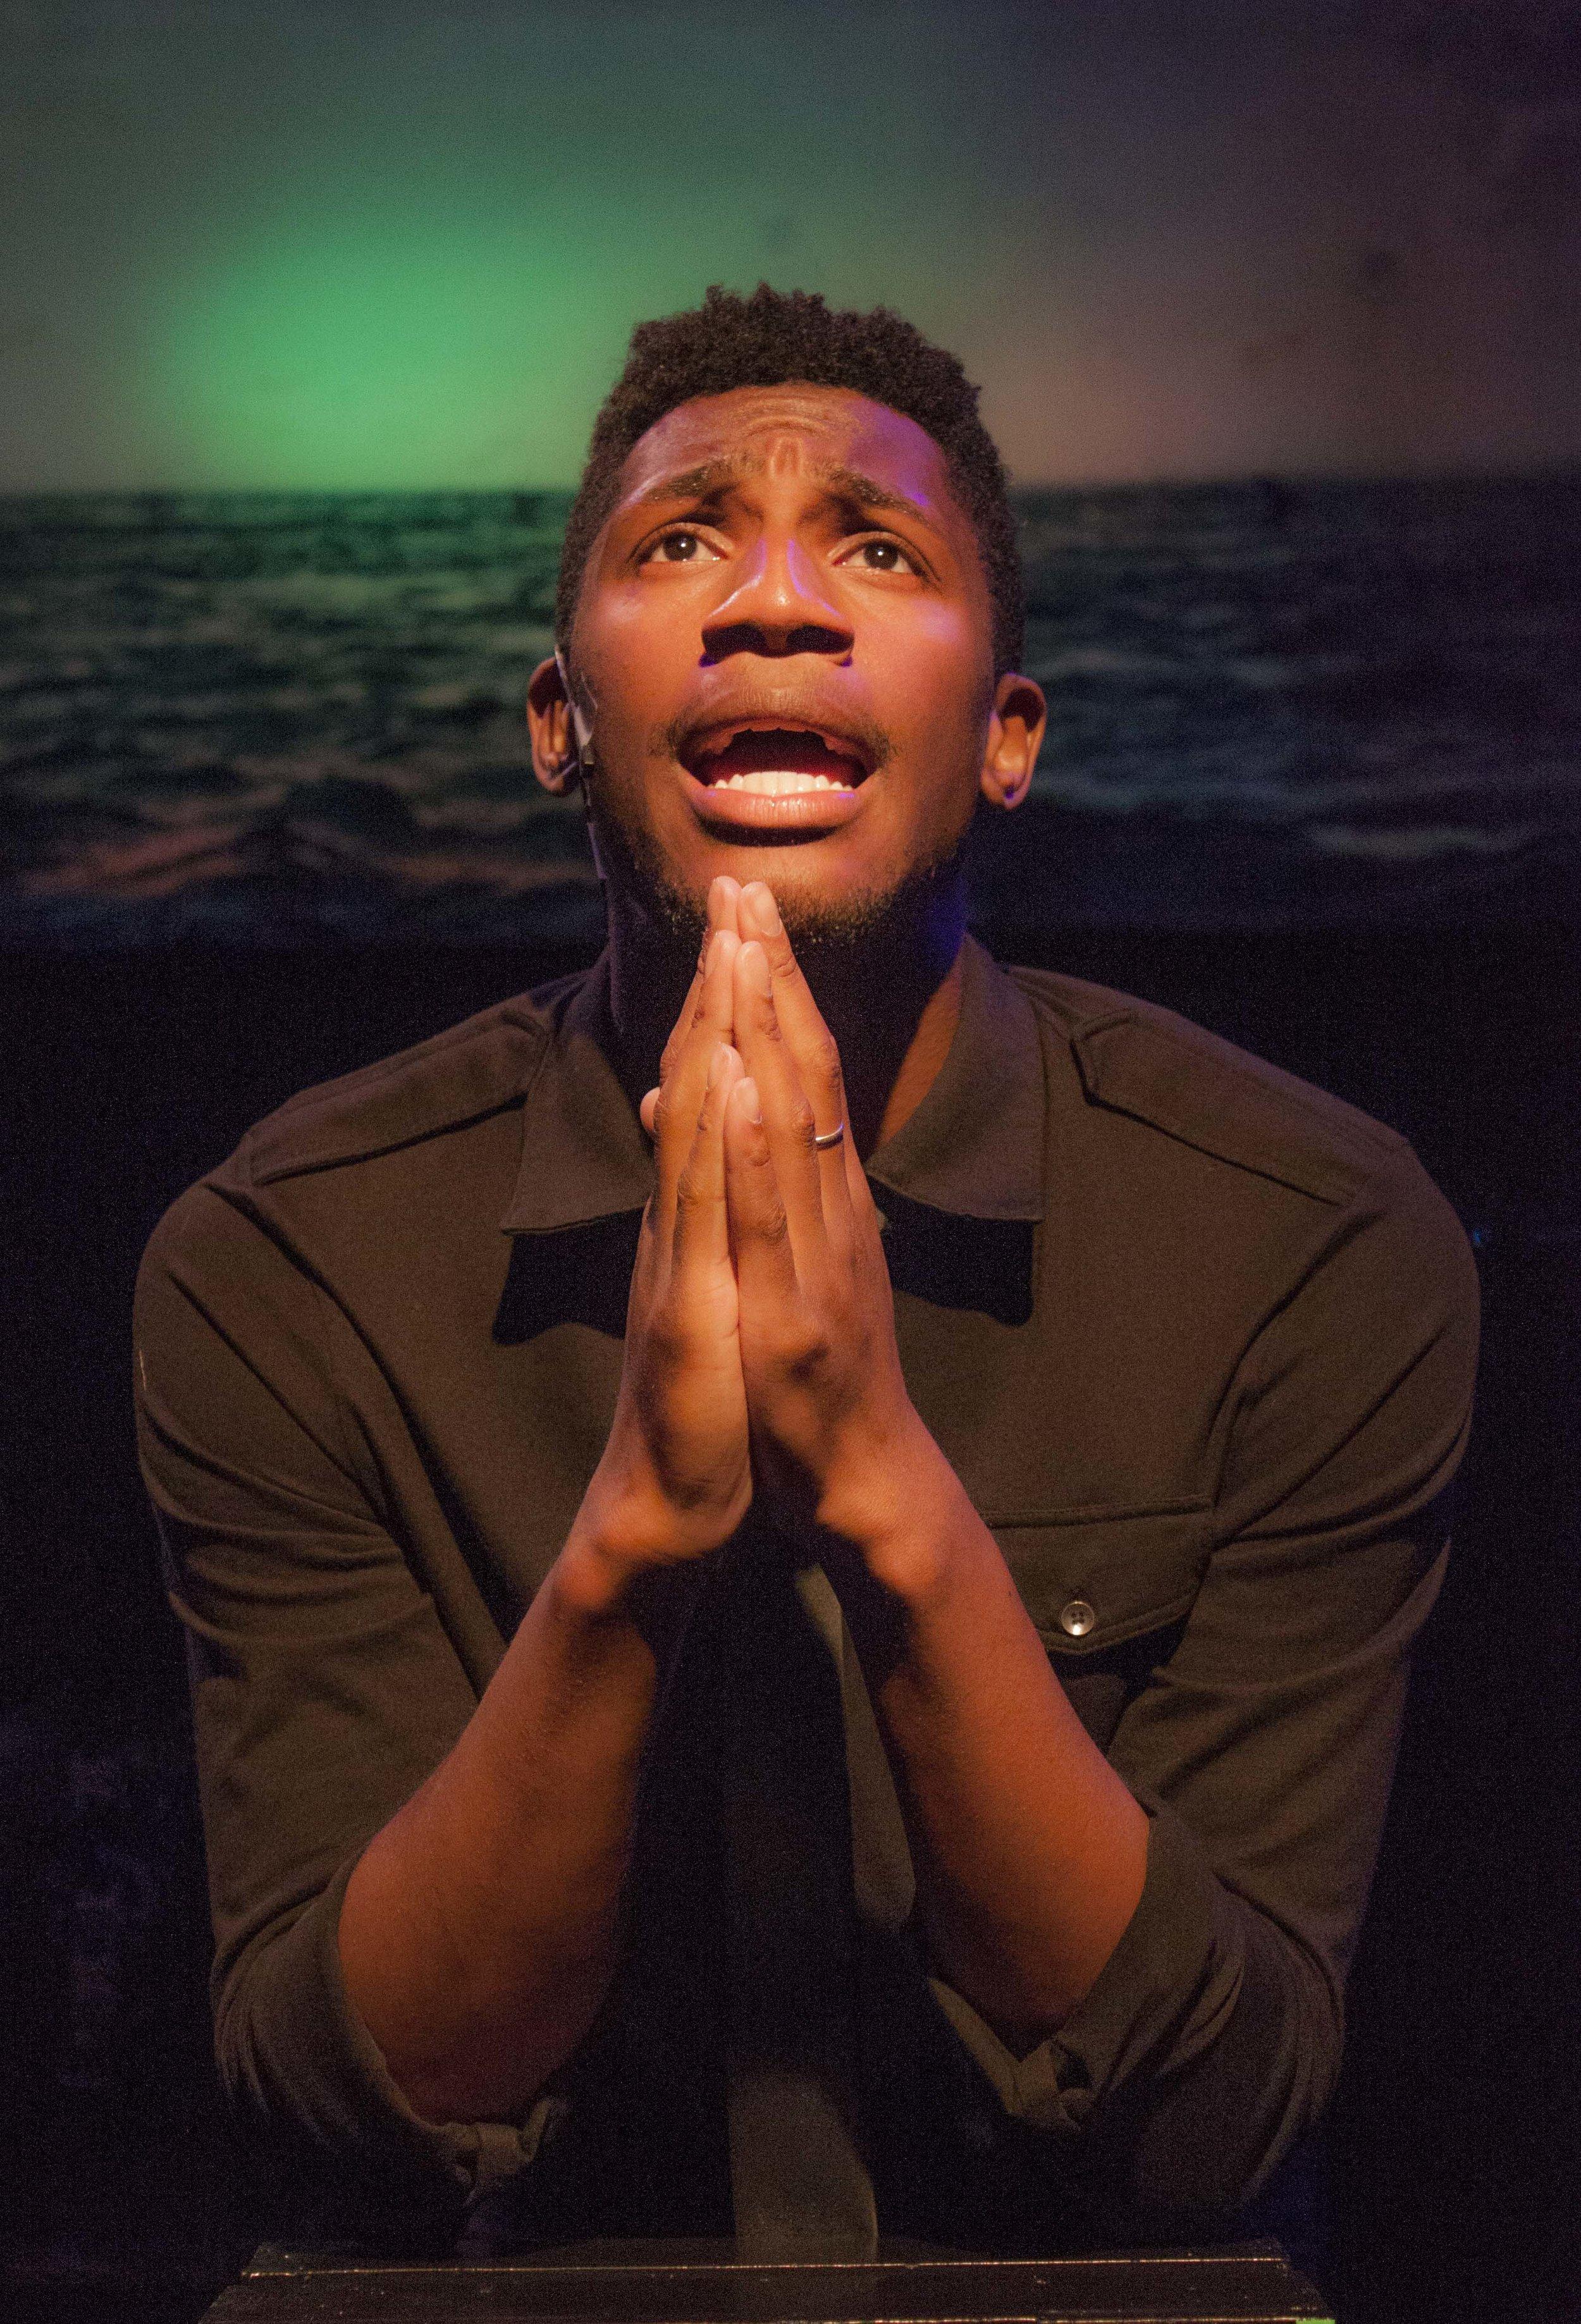 Man 1 (Antonio Tillman) praying through song